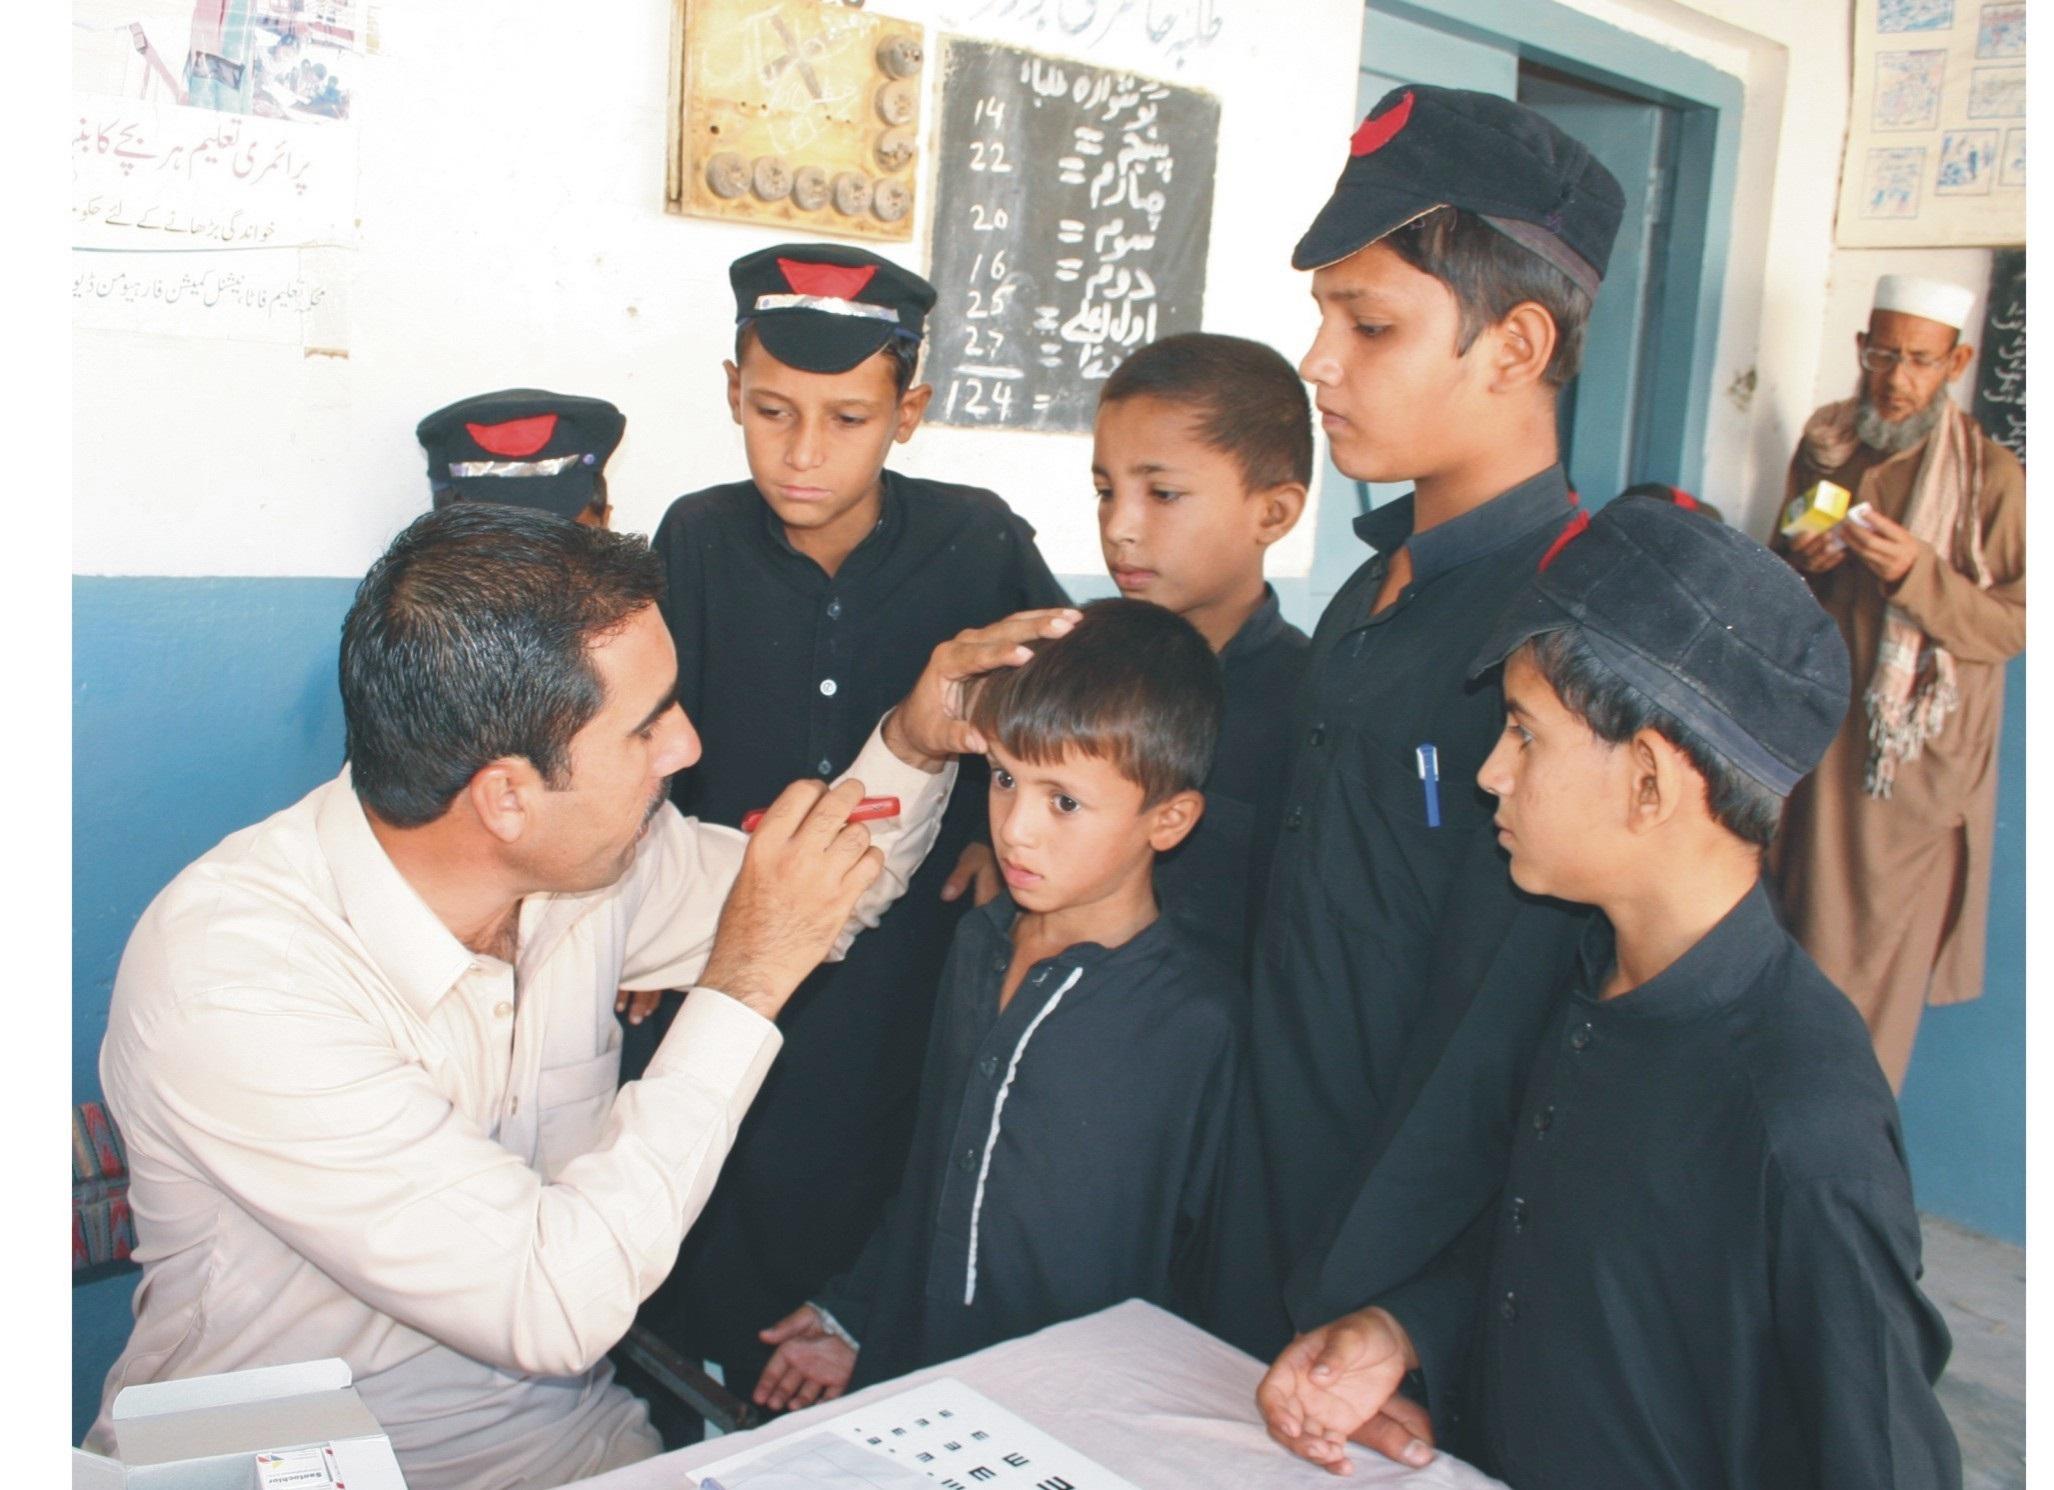 Medics return to duty in FATA hospitals